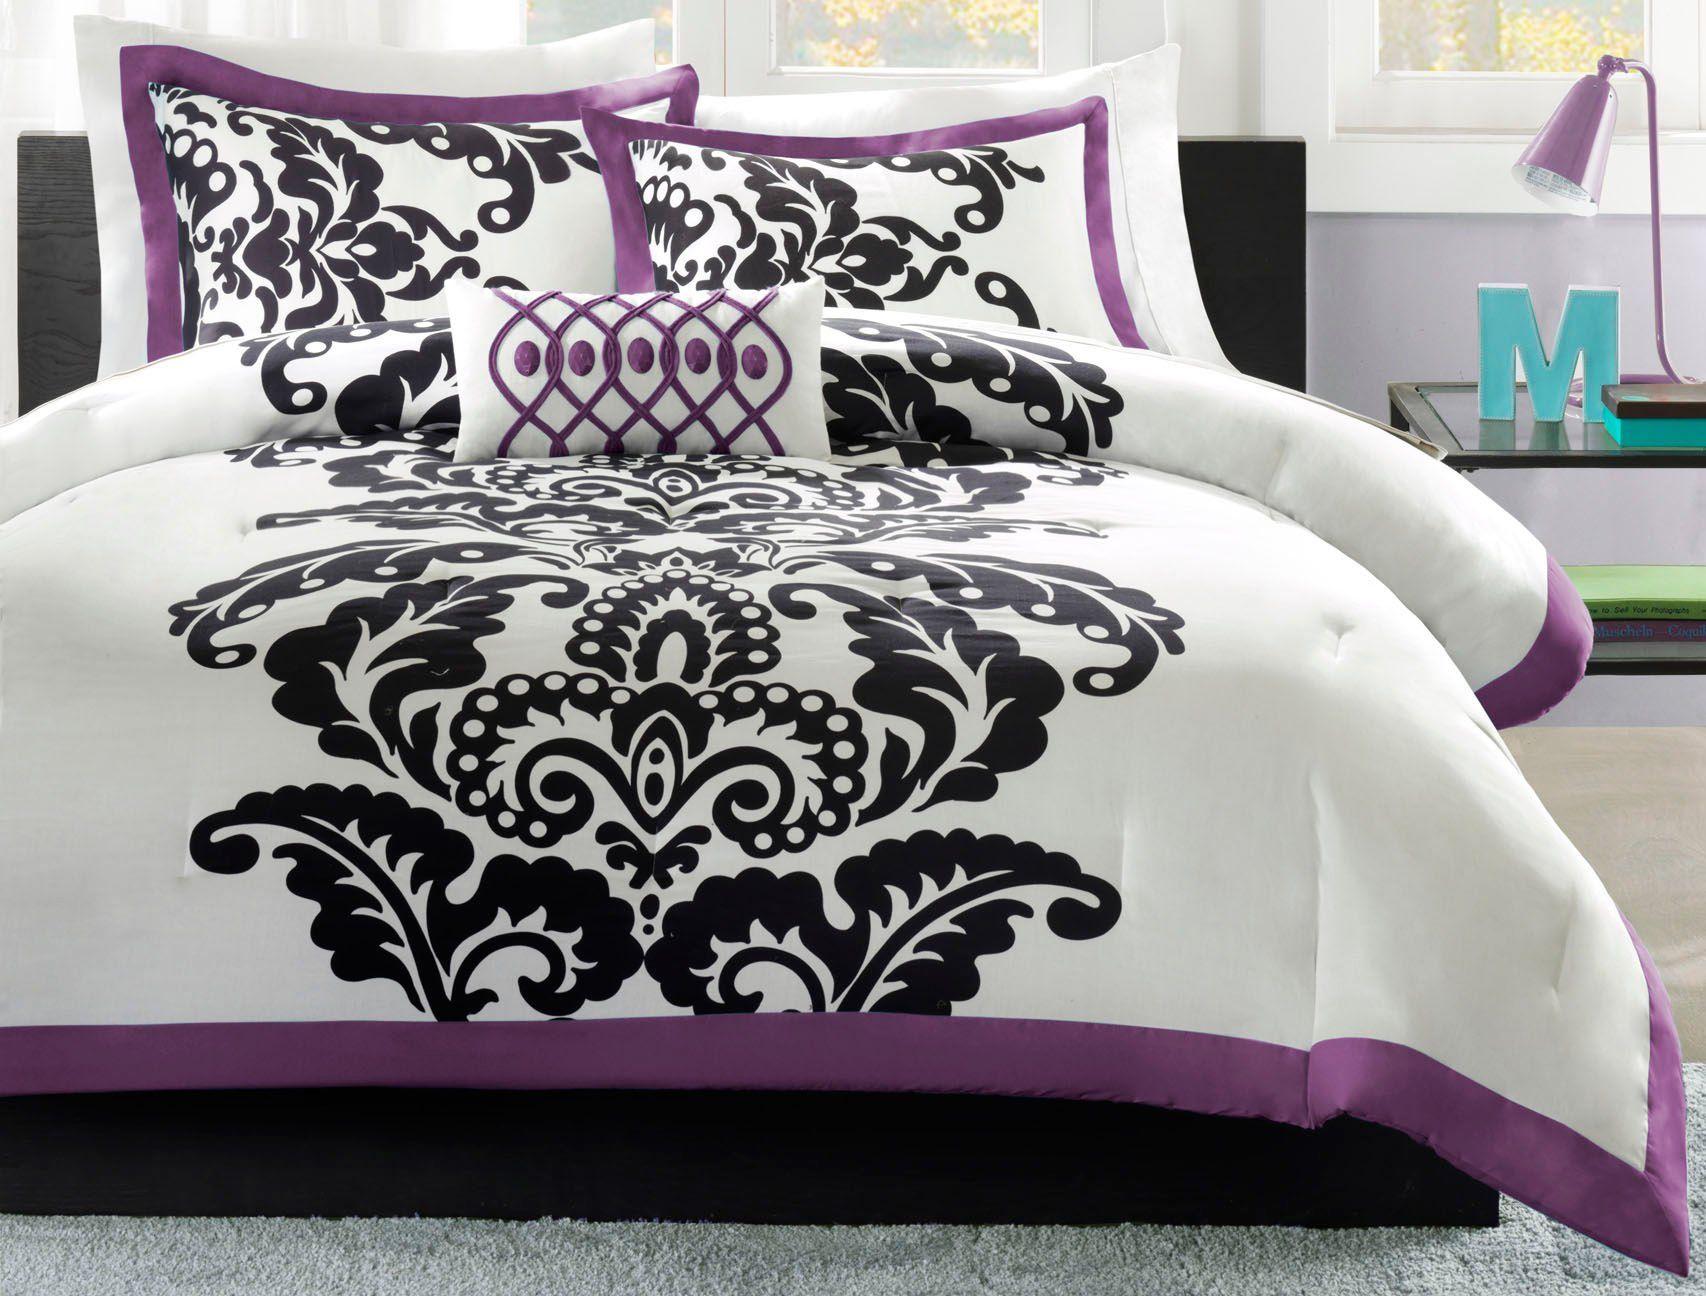 Florentine Comforter Set Size Twin / Twin